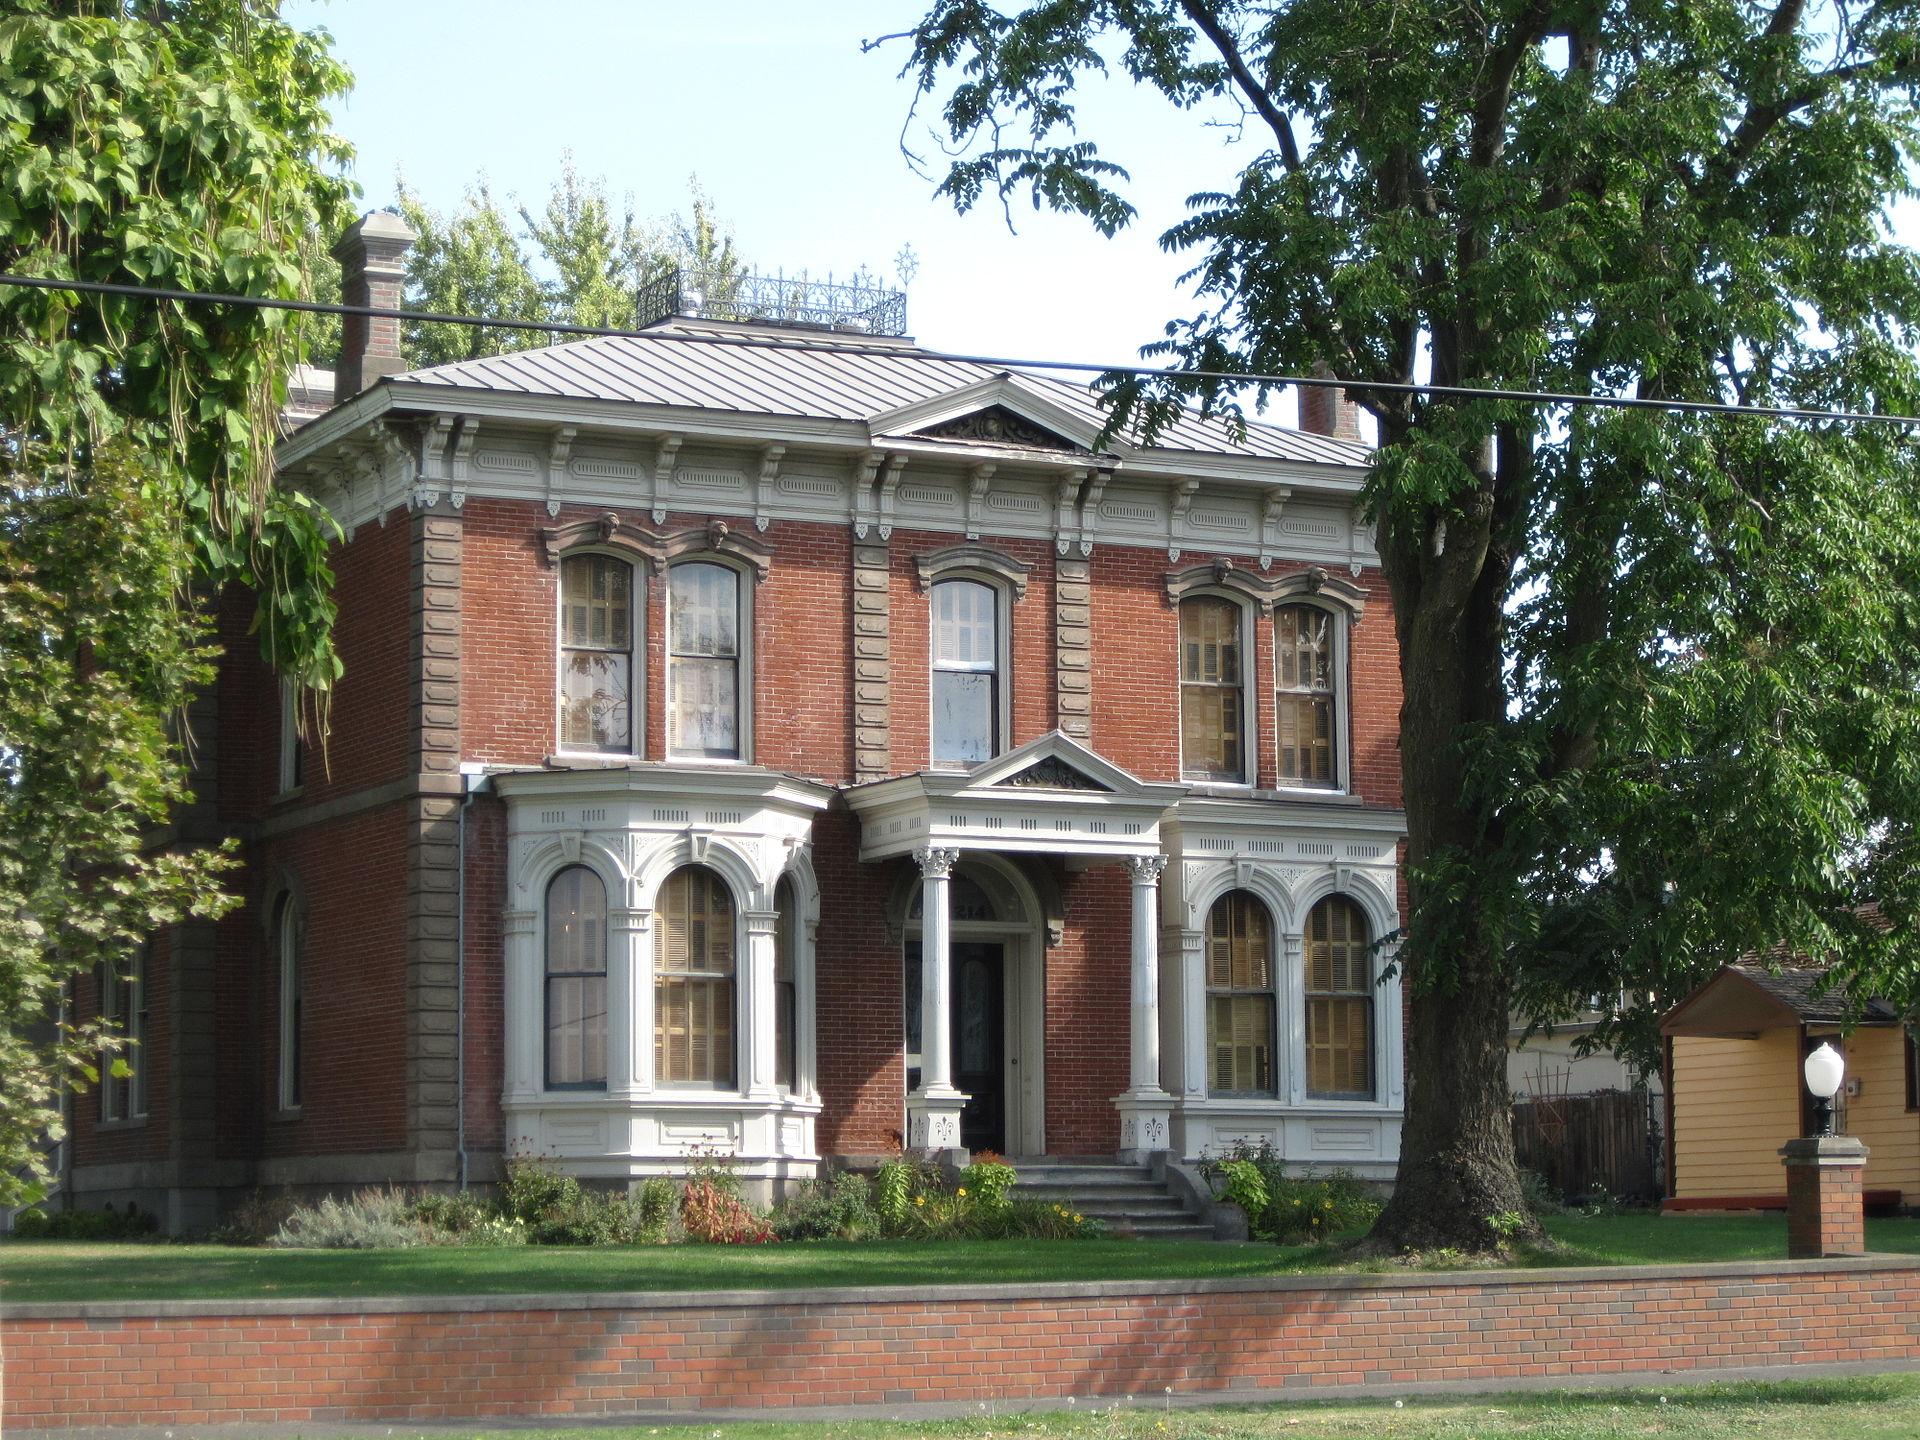 The Kirkman House